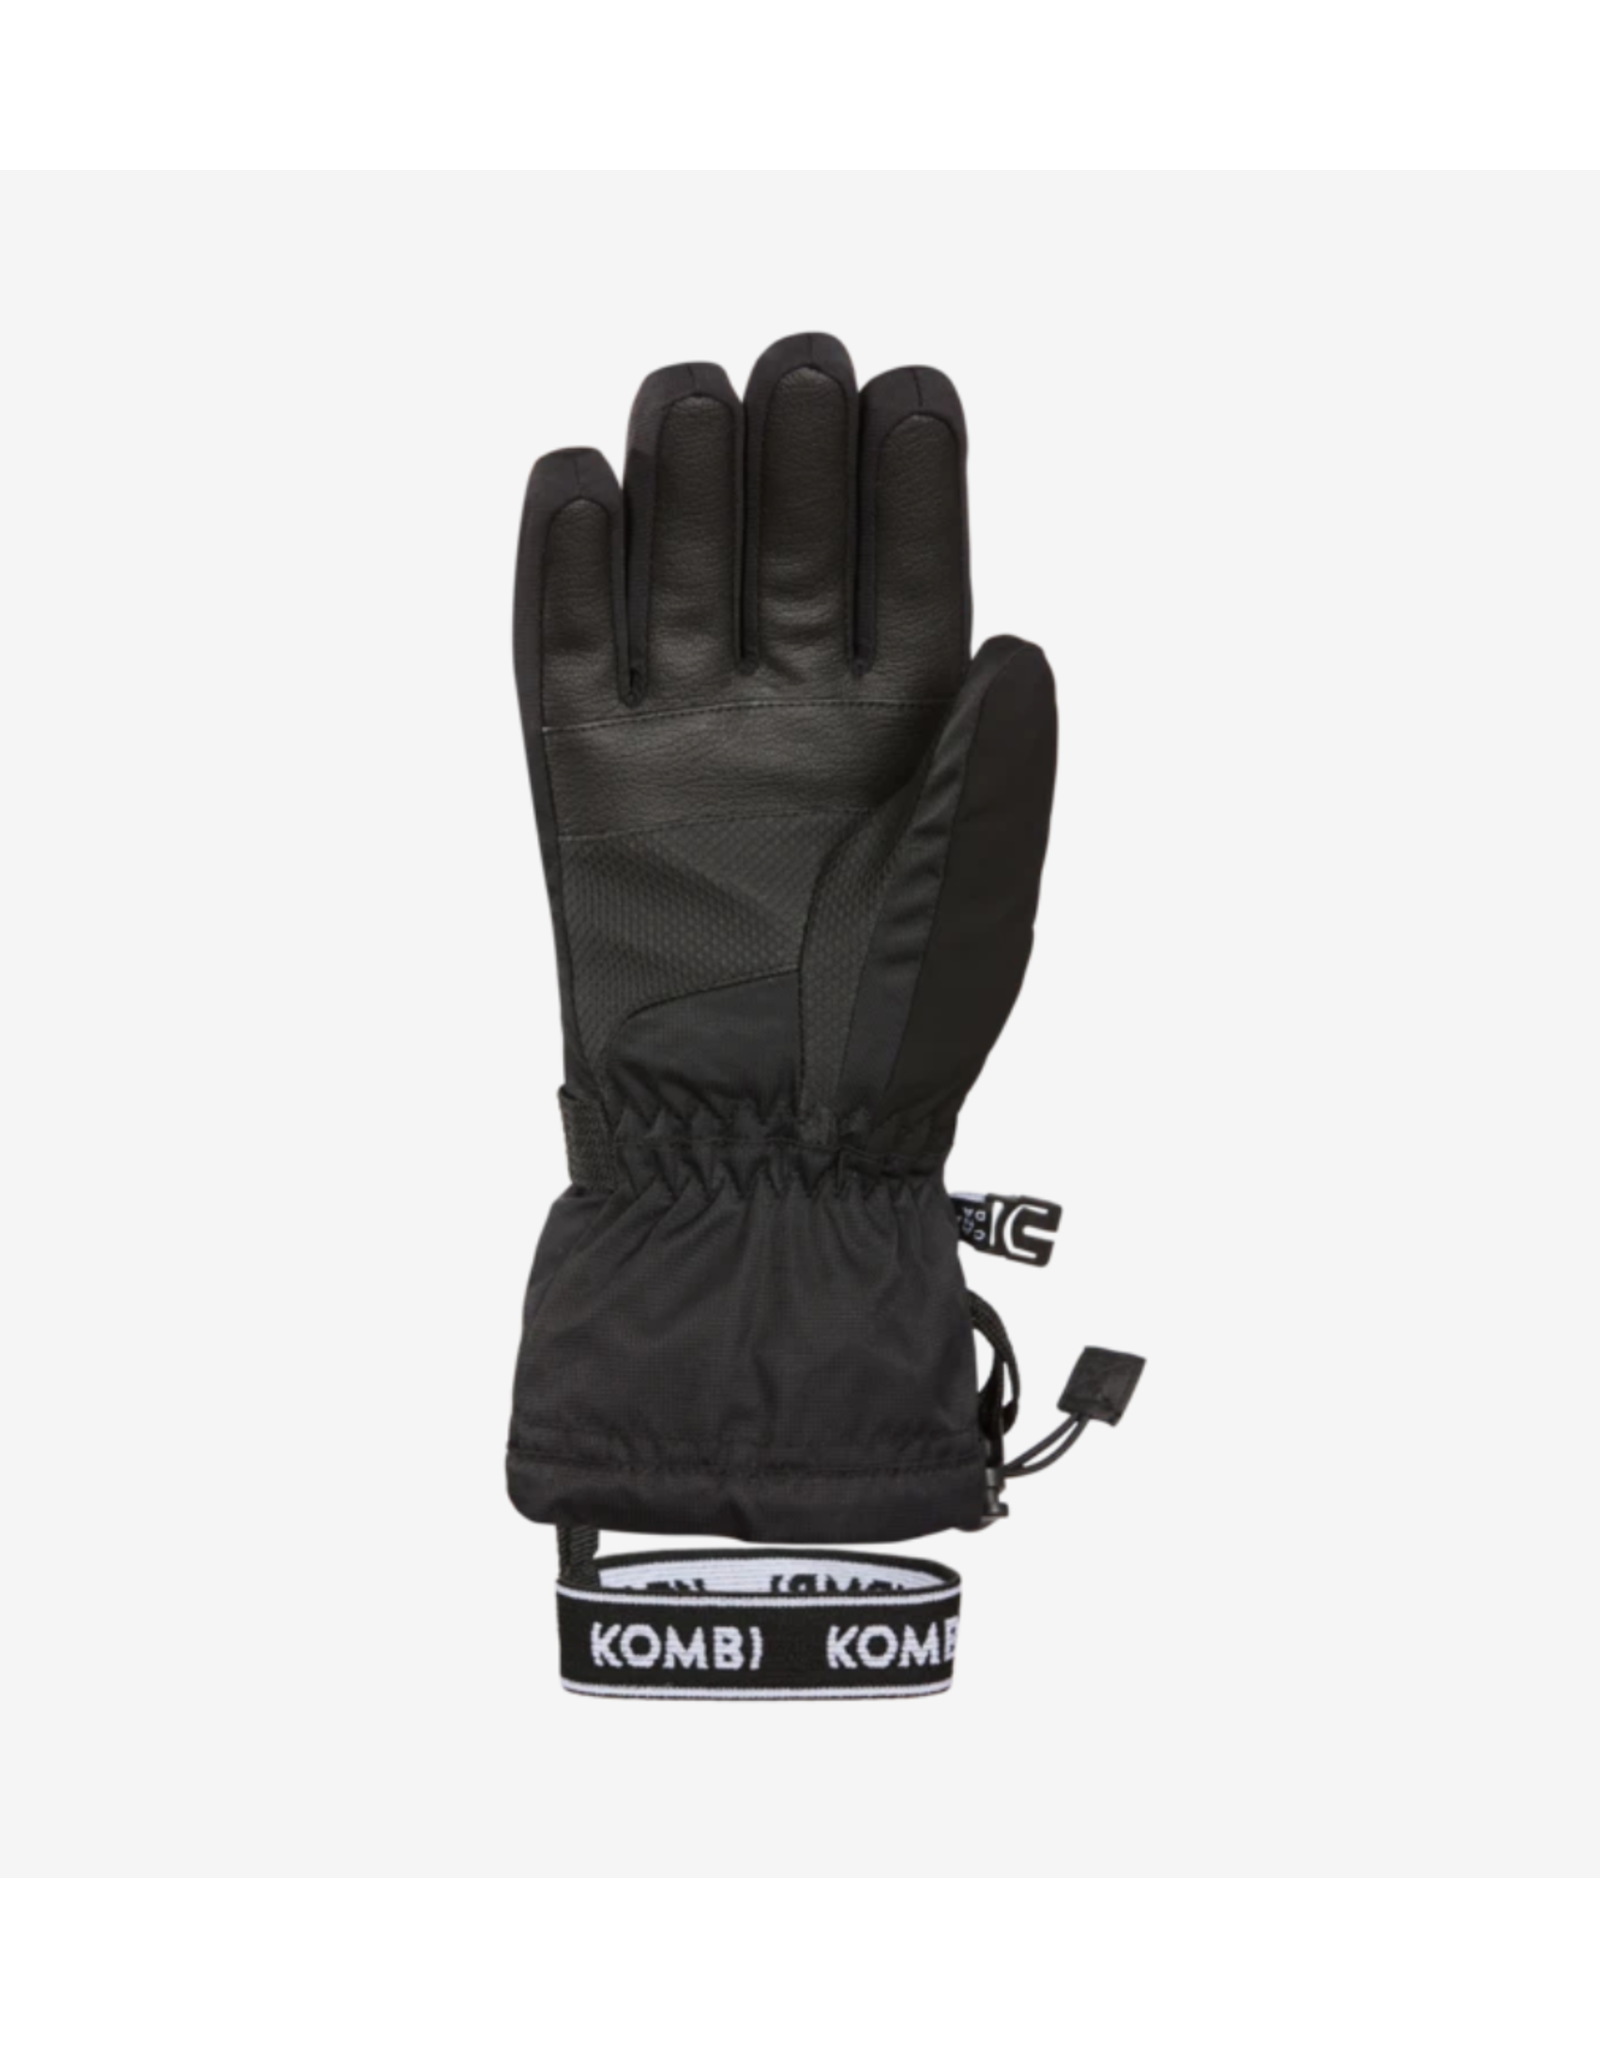 Kombi Zenith Junior GORE-TEX Glove